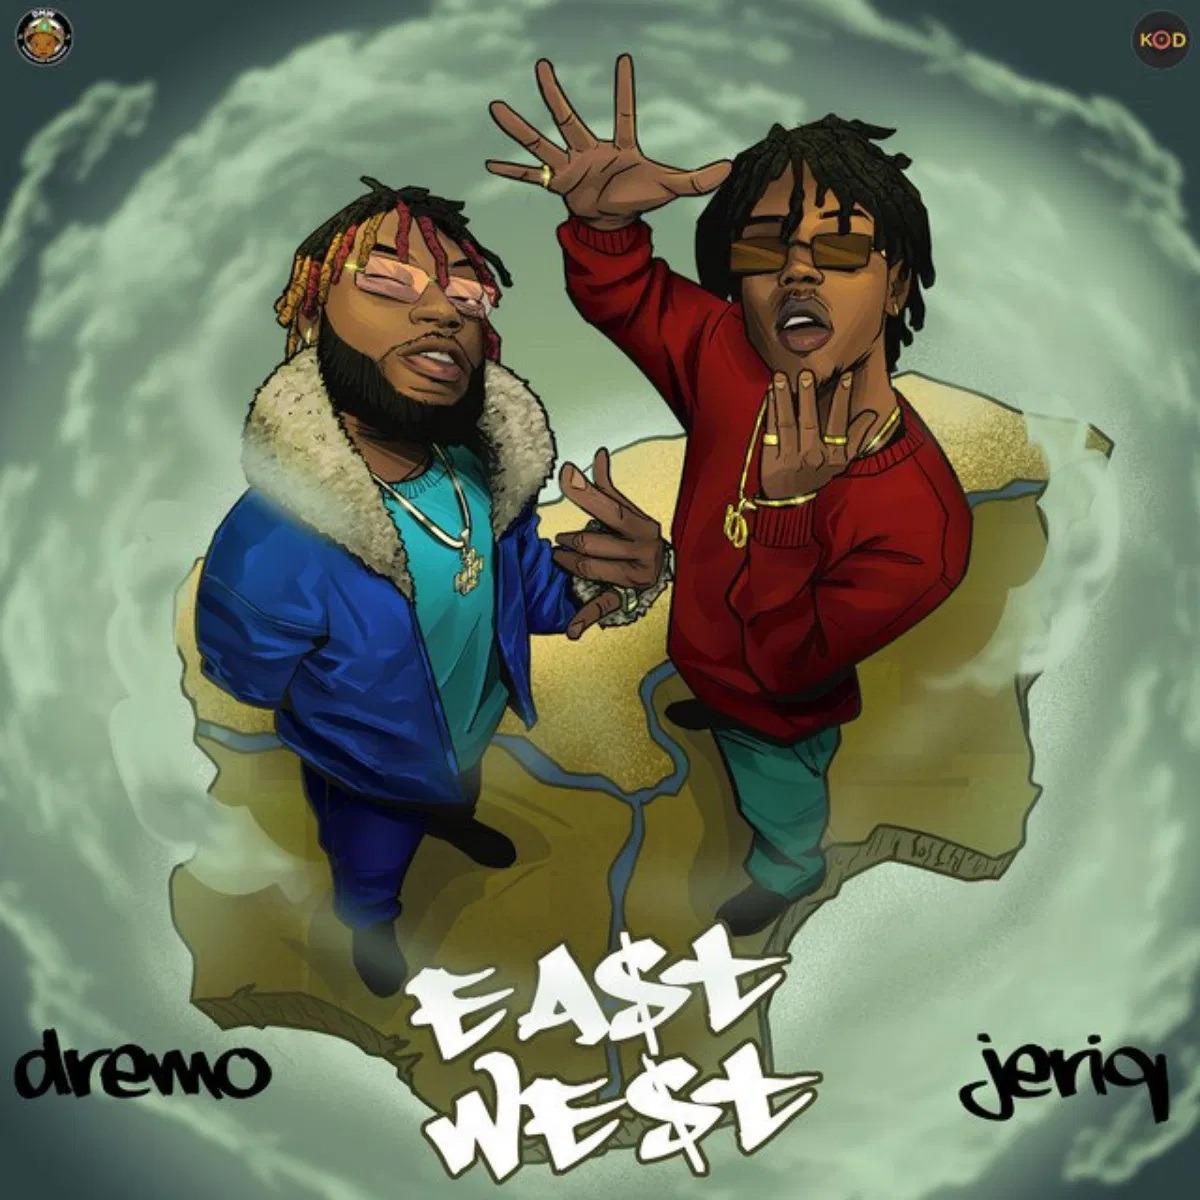 Jeriq & Dremo East And West